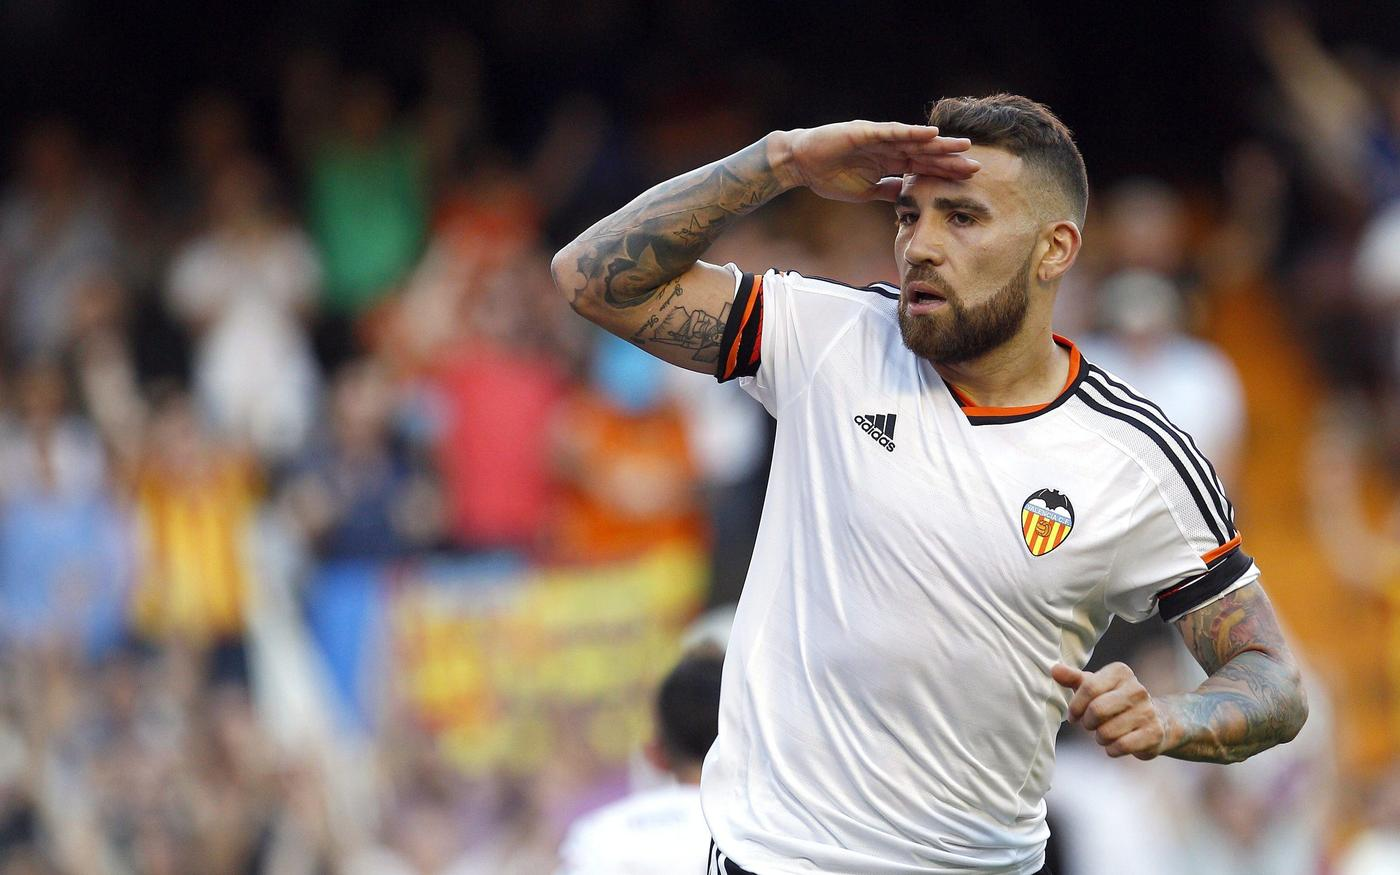 Manchester United 'told to pay £35.9m to land Valencia centre-back Nicolas Otamendi'